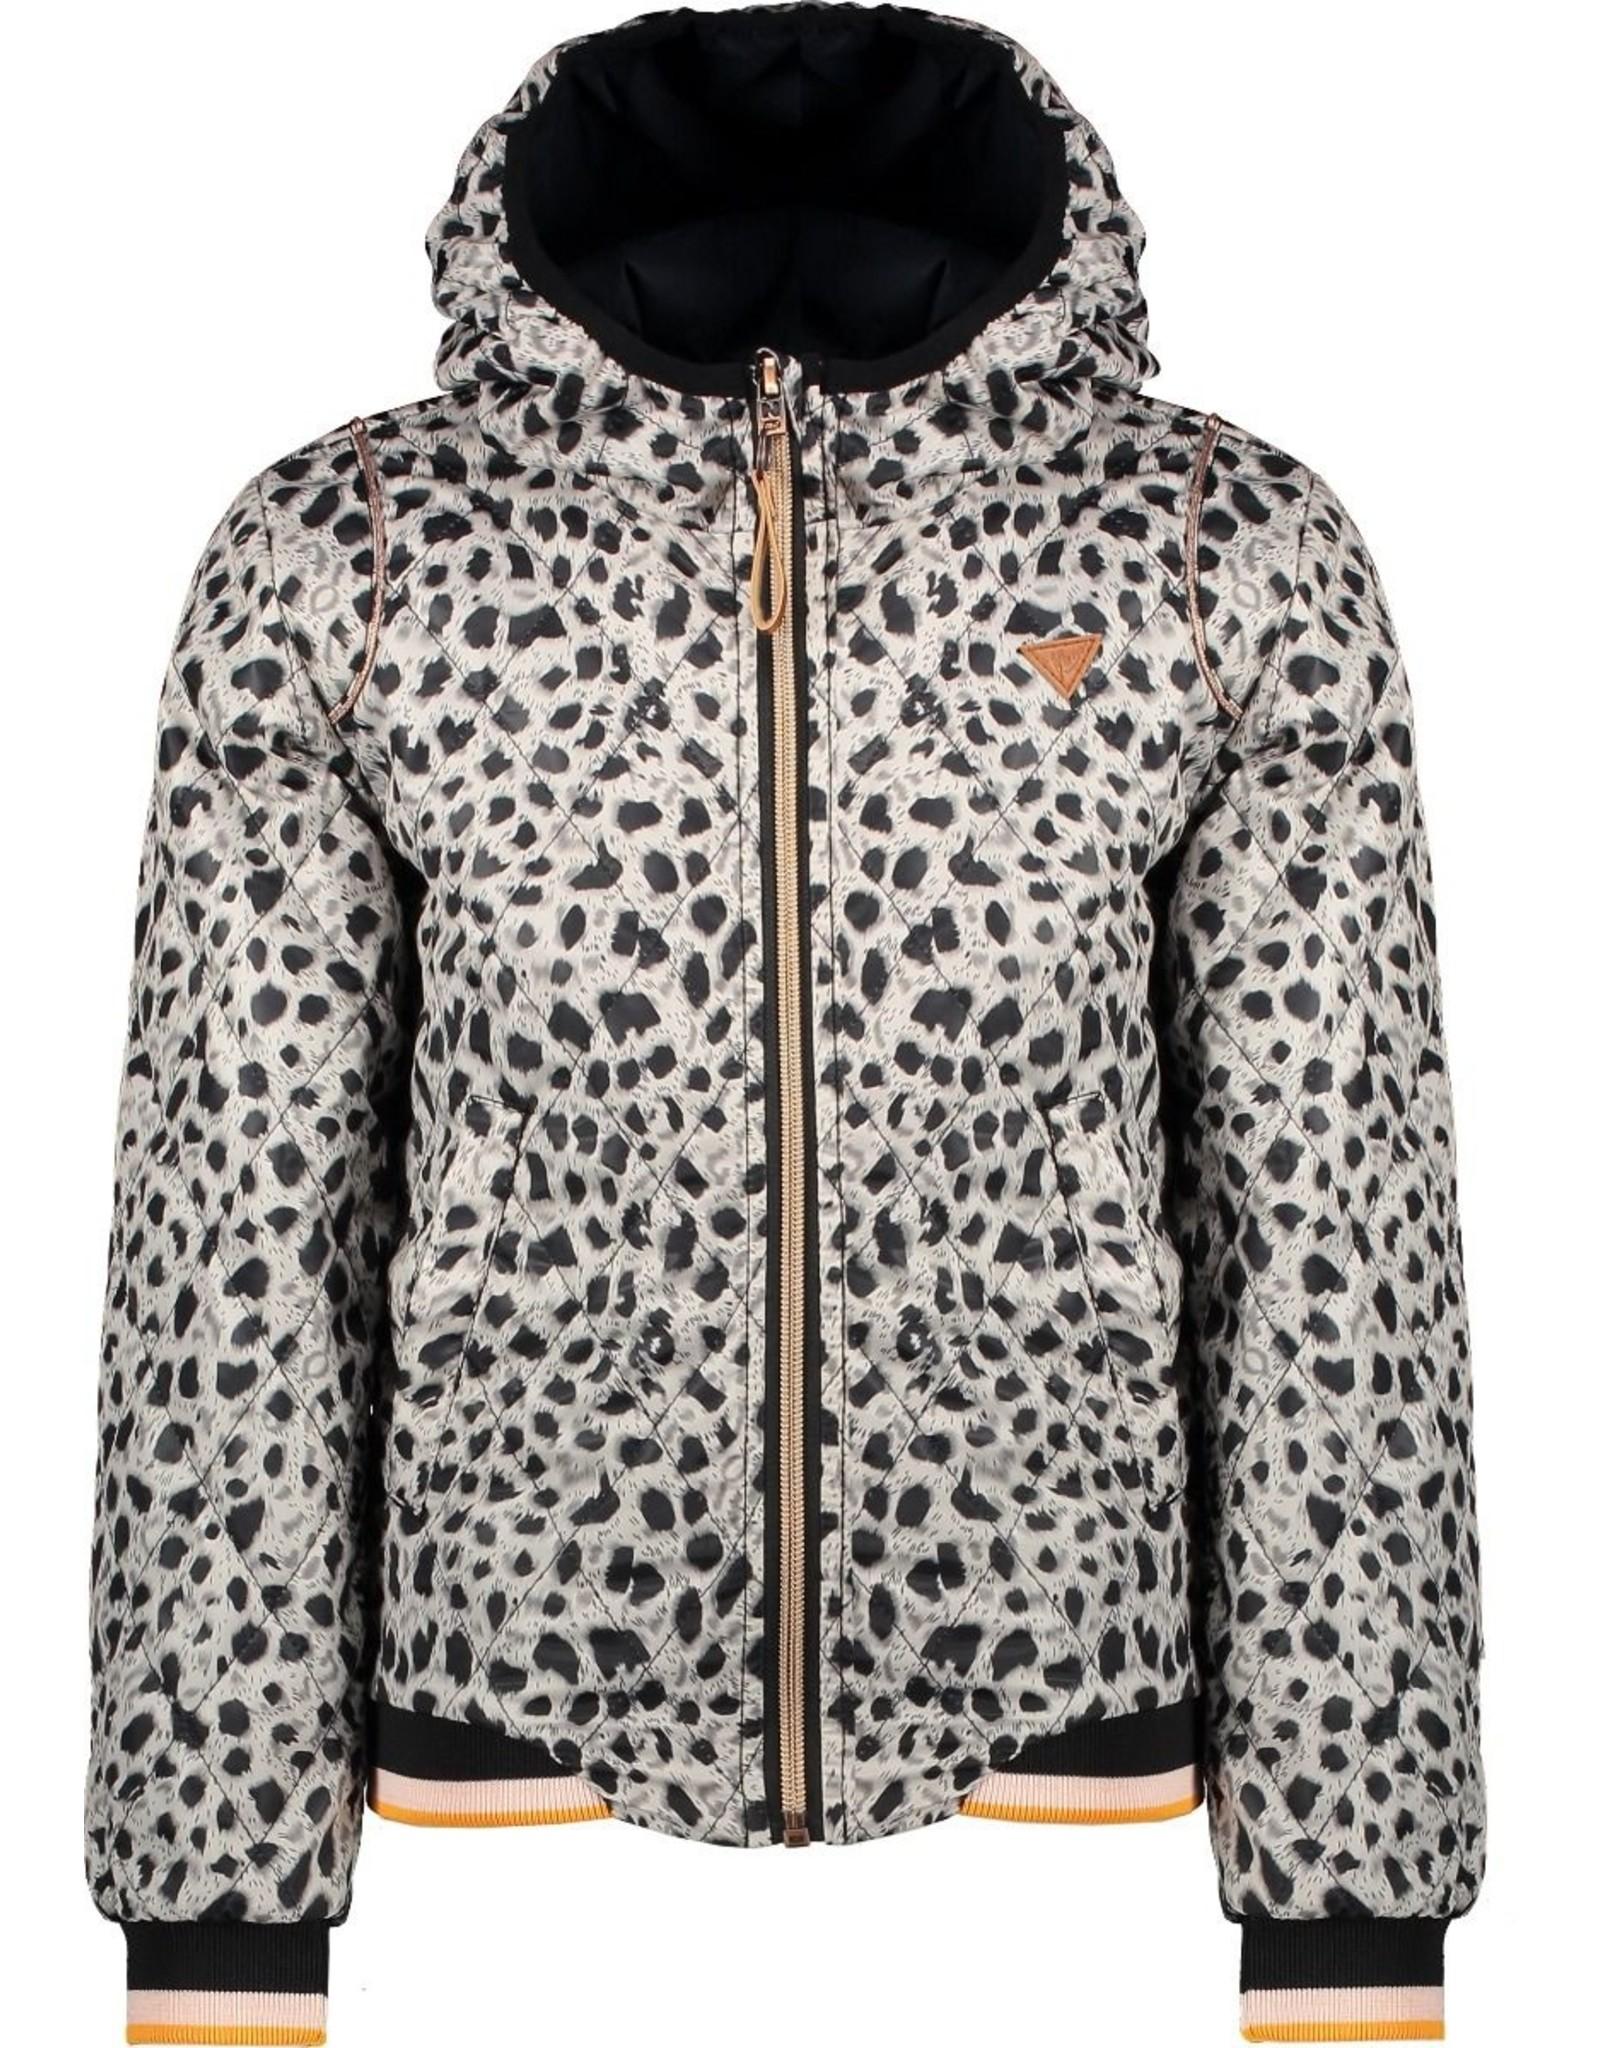 NONO NoNo Billy Hooded Summer Jacket Antracite